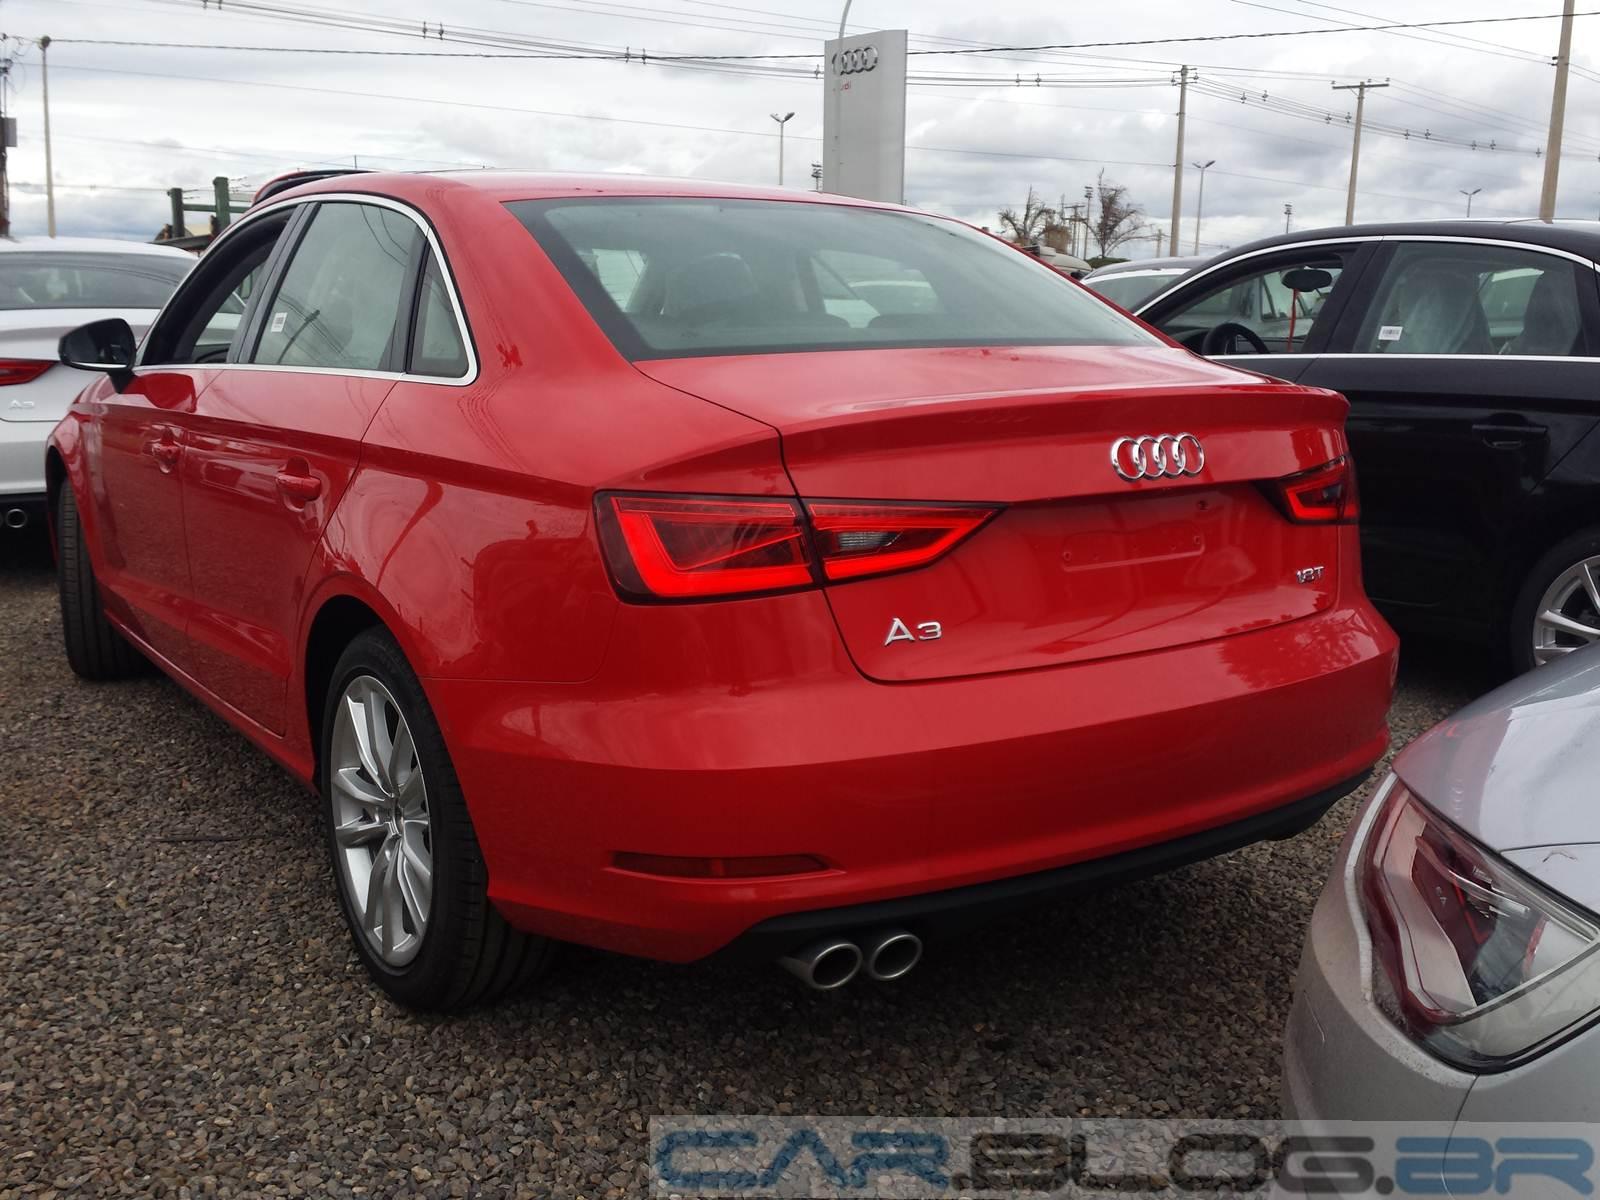 Novo Audi A3 Sedan 2014 vermelho